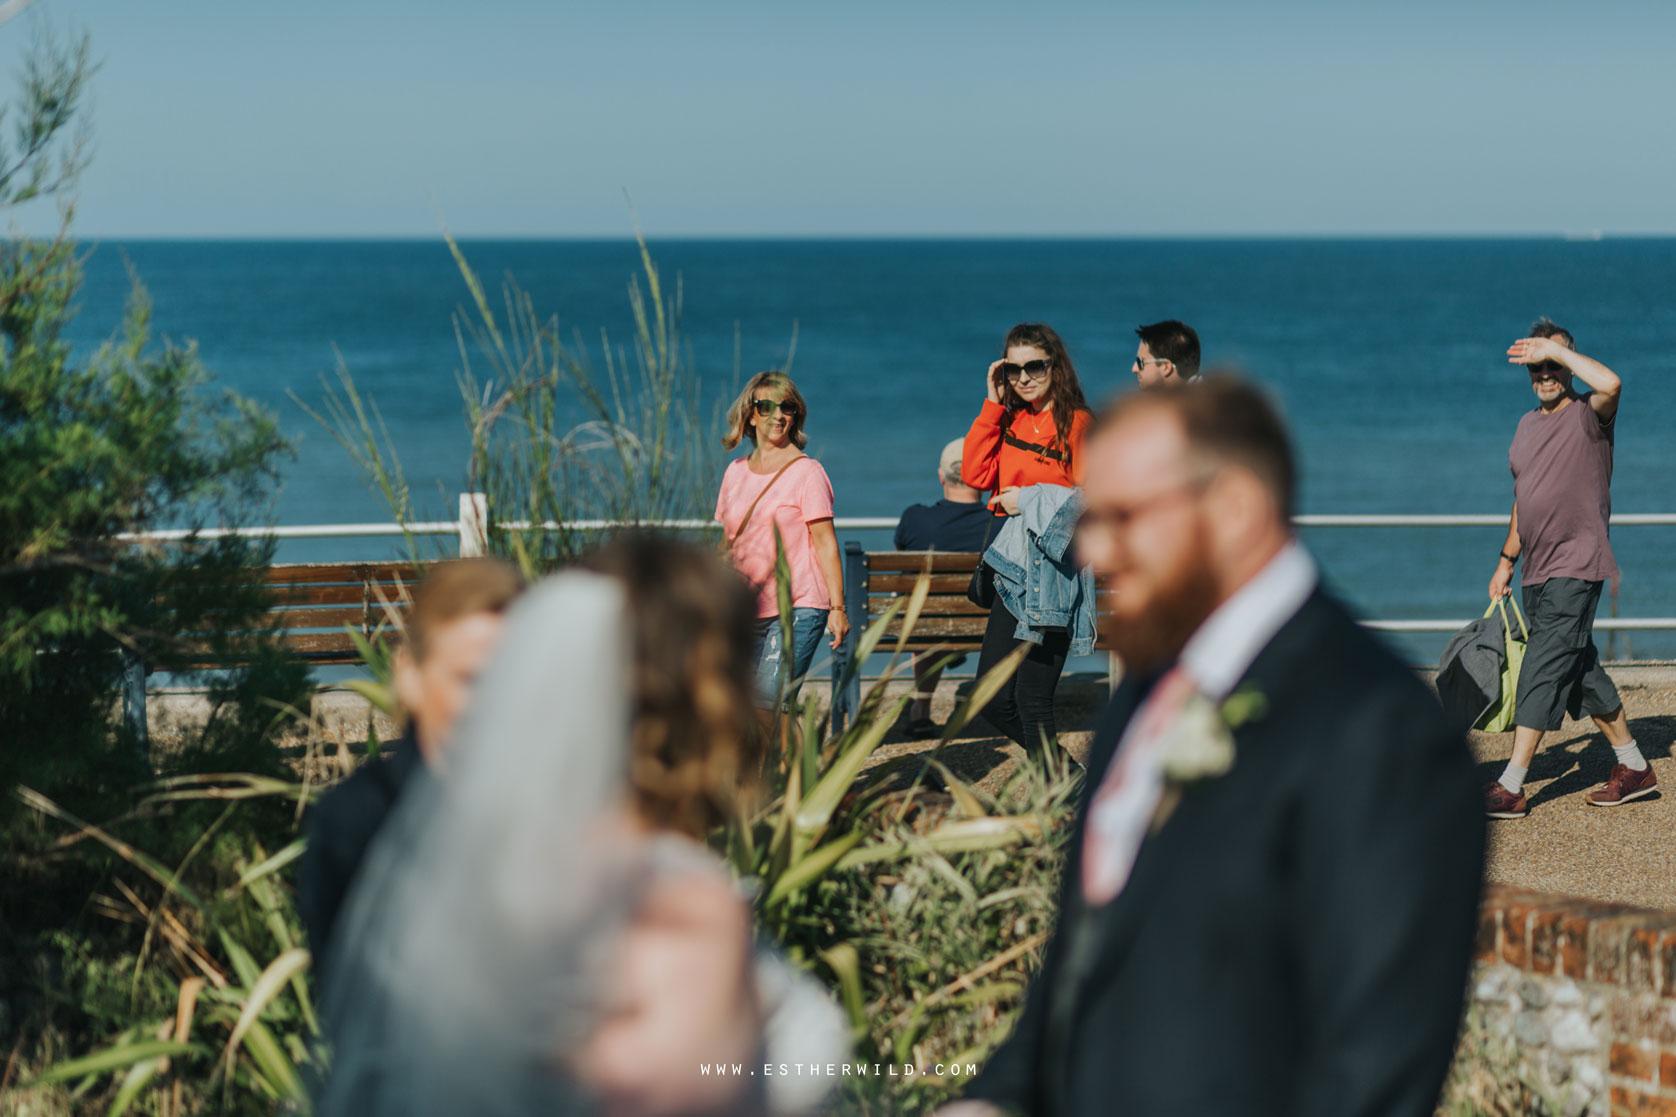 Cromer_Wedding_Beach_Outdoor_Ceremony_Norfolk_North_Lodge_Registry_Office_Rocket_House_Cafe_Cromer_Pier_IMG_3755_IMGL7954.jpg